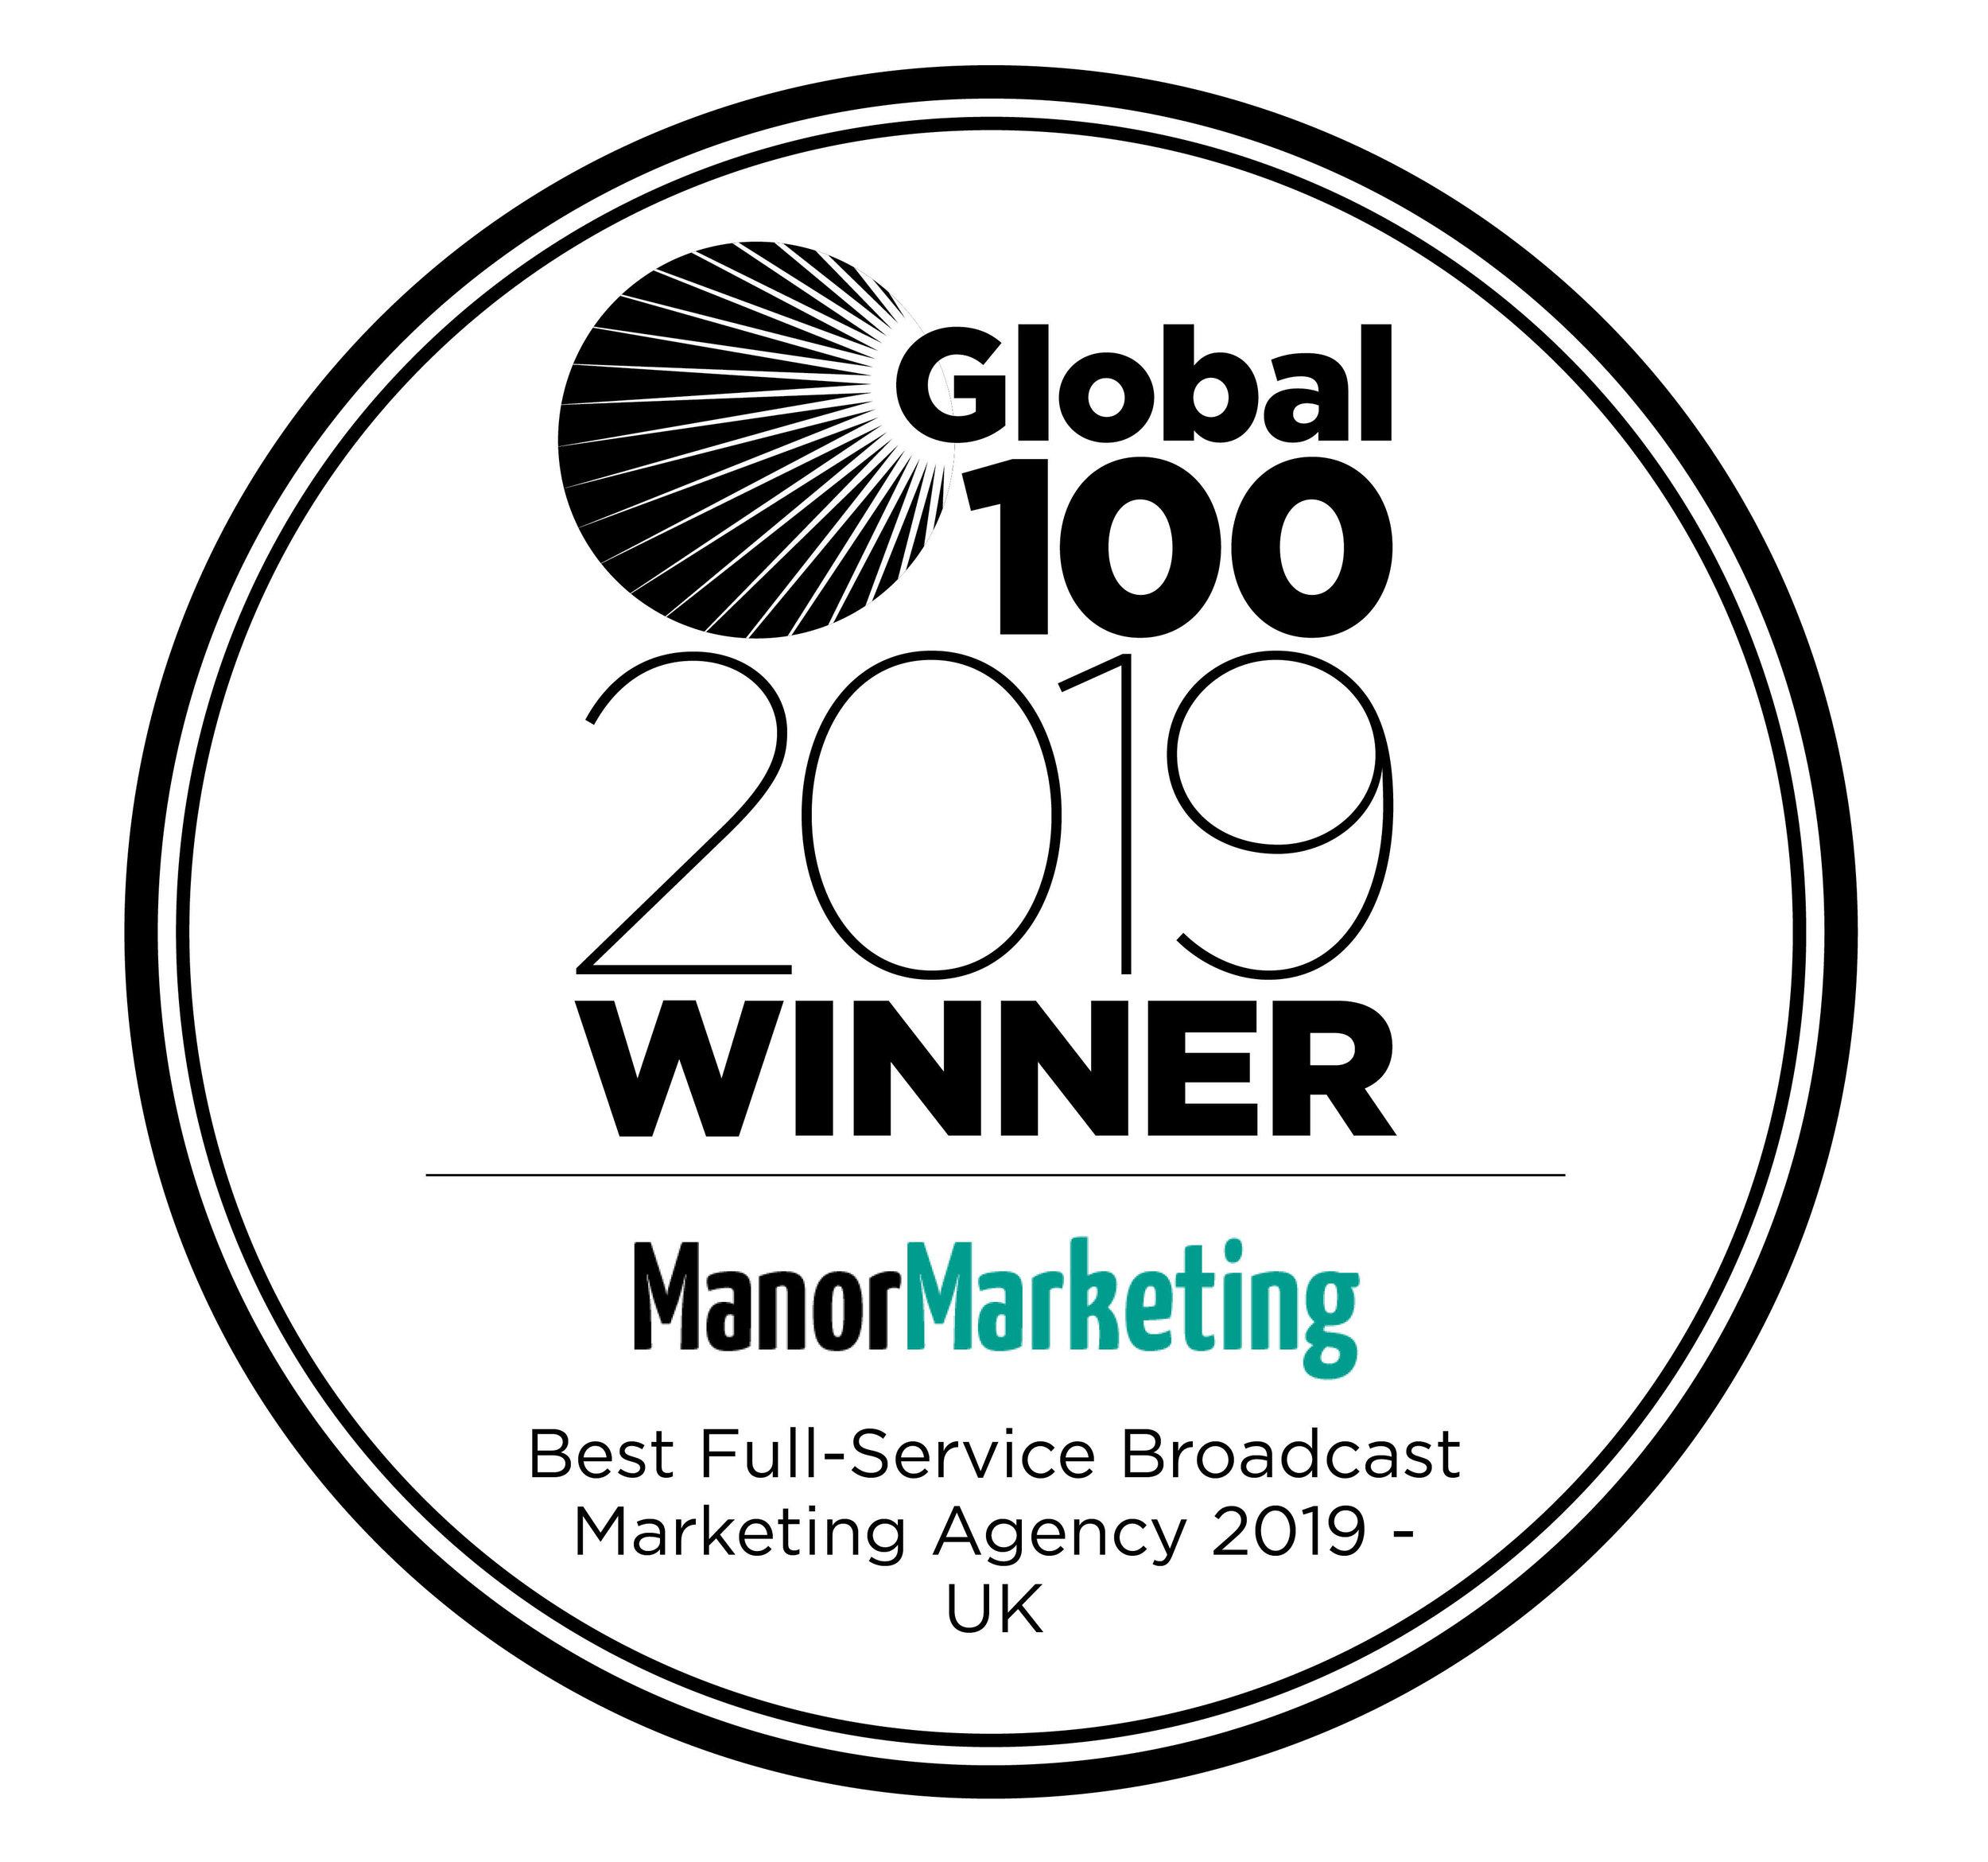 Global 100 - 2019 award logo Manor Marketing Consultants Ltd.jpg